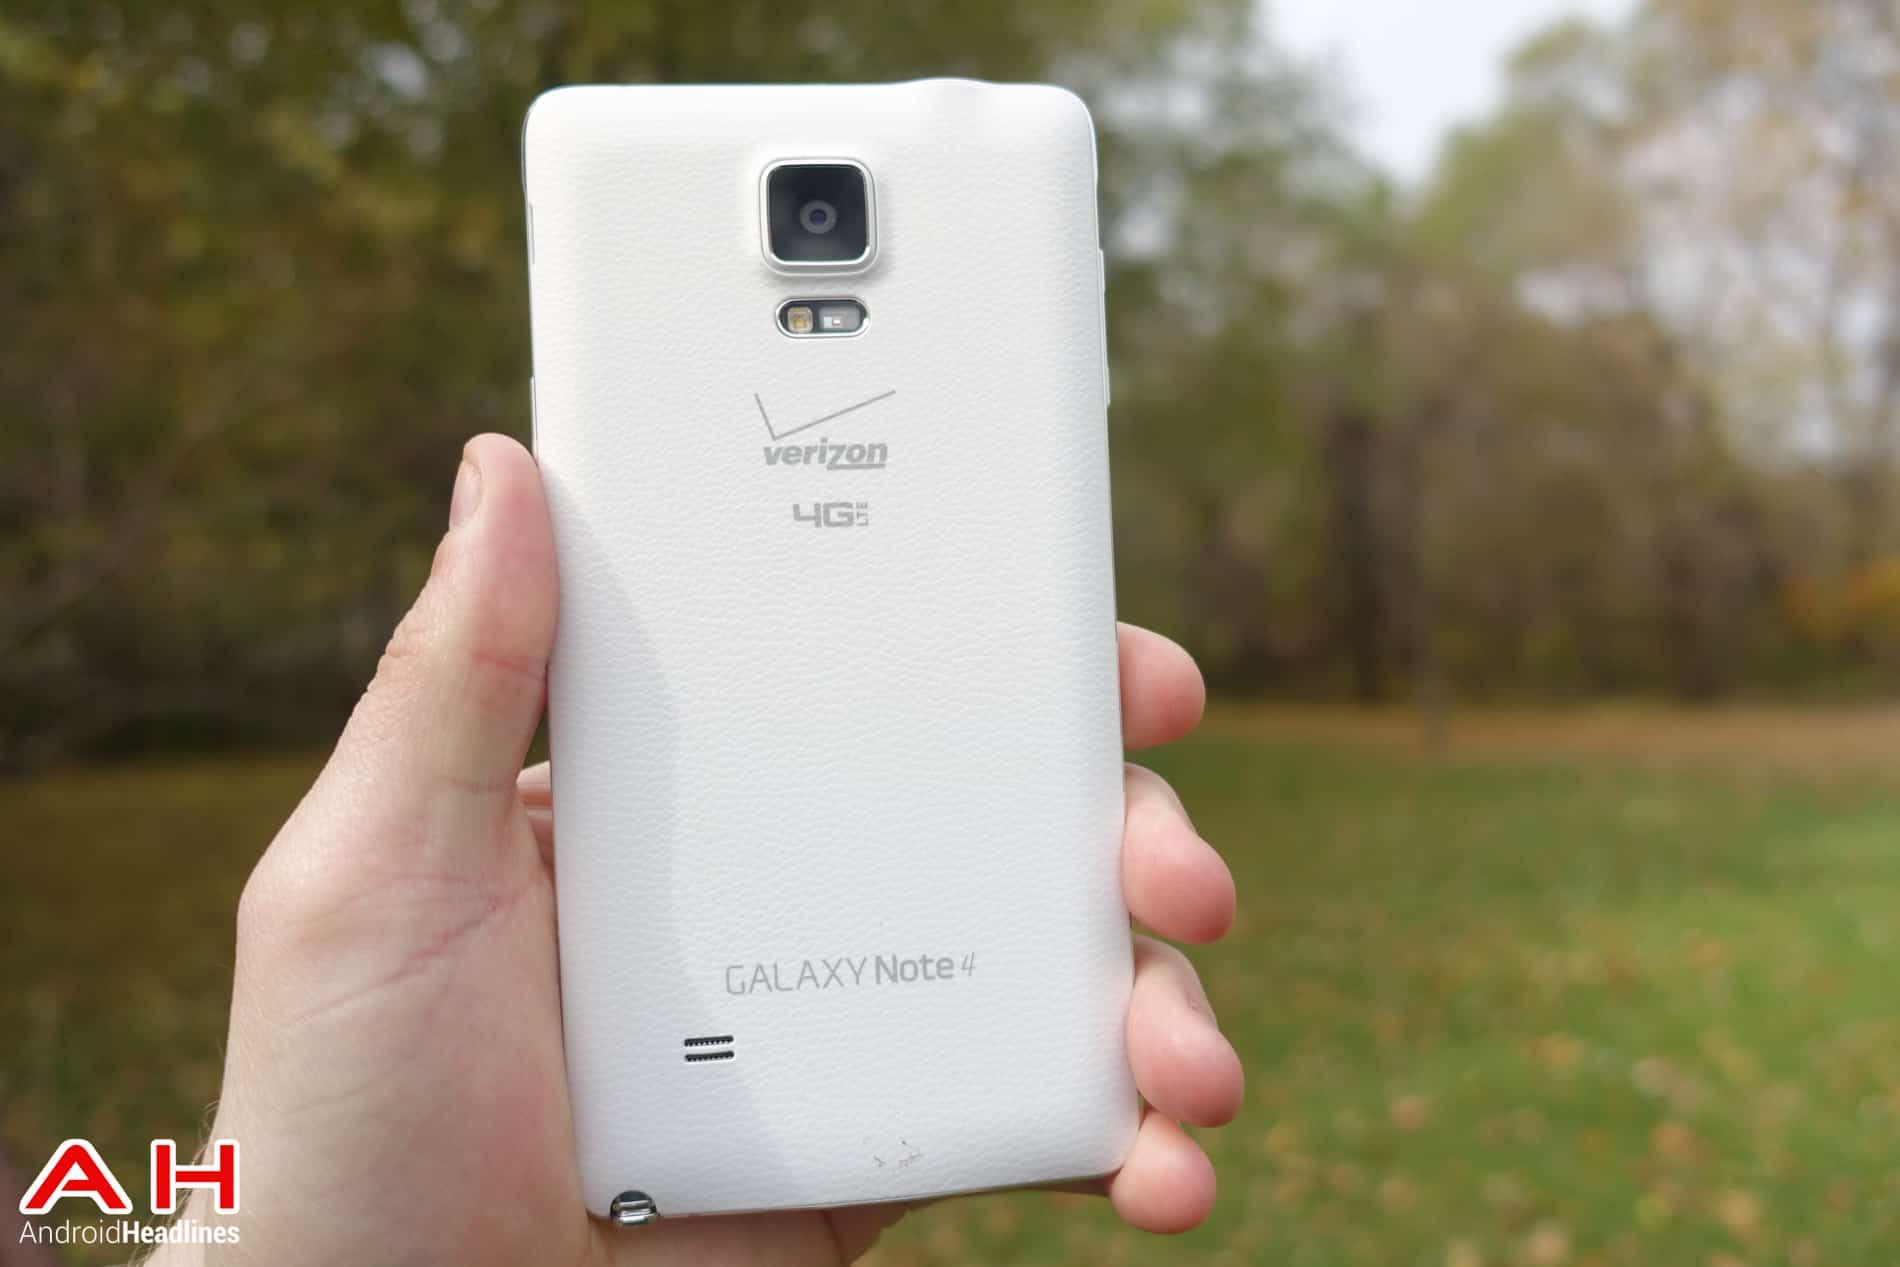 Samsung-Galaxy-Note-4-AH-19